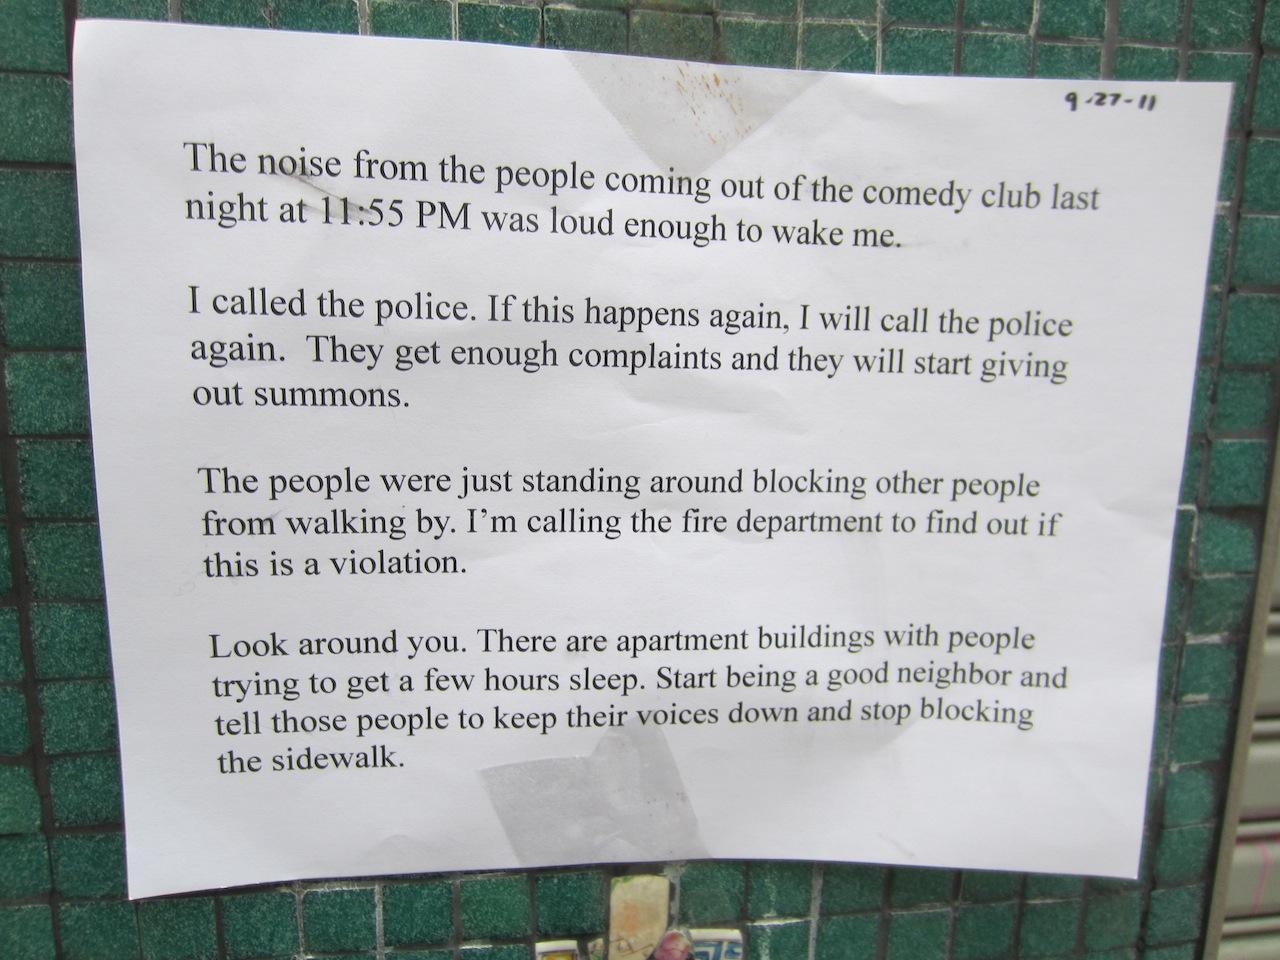 Ev grieve neighbors leave first urban etiquette sign for ucbeast altavistaventures Gallery